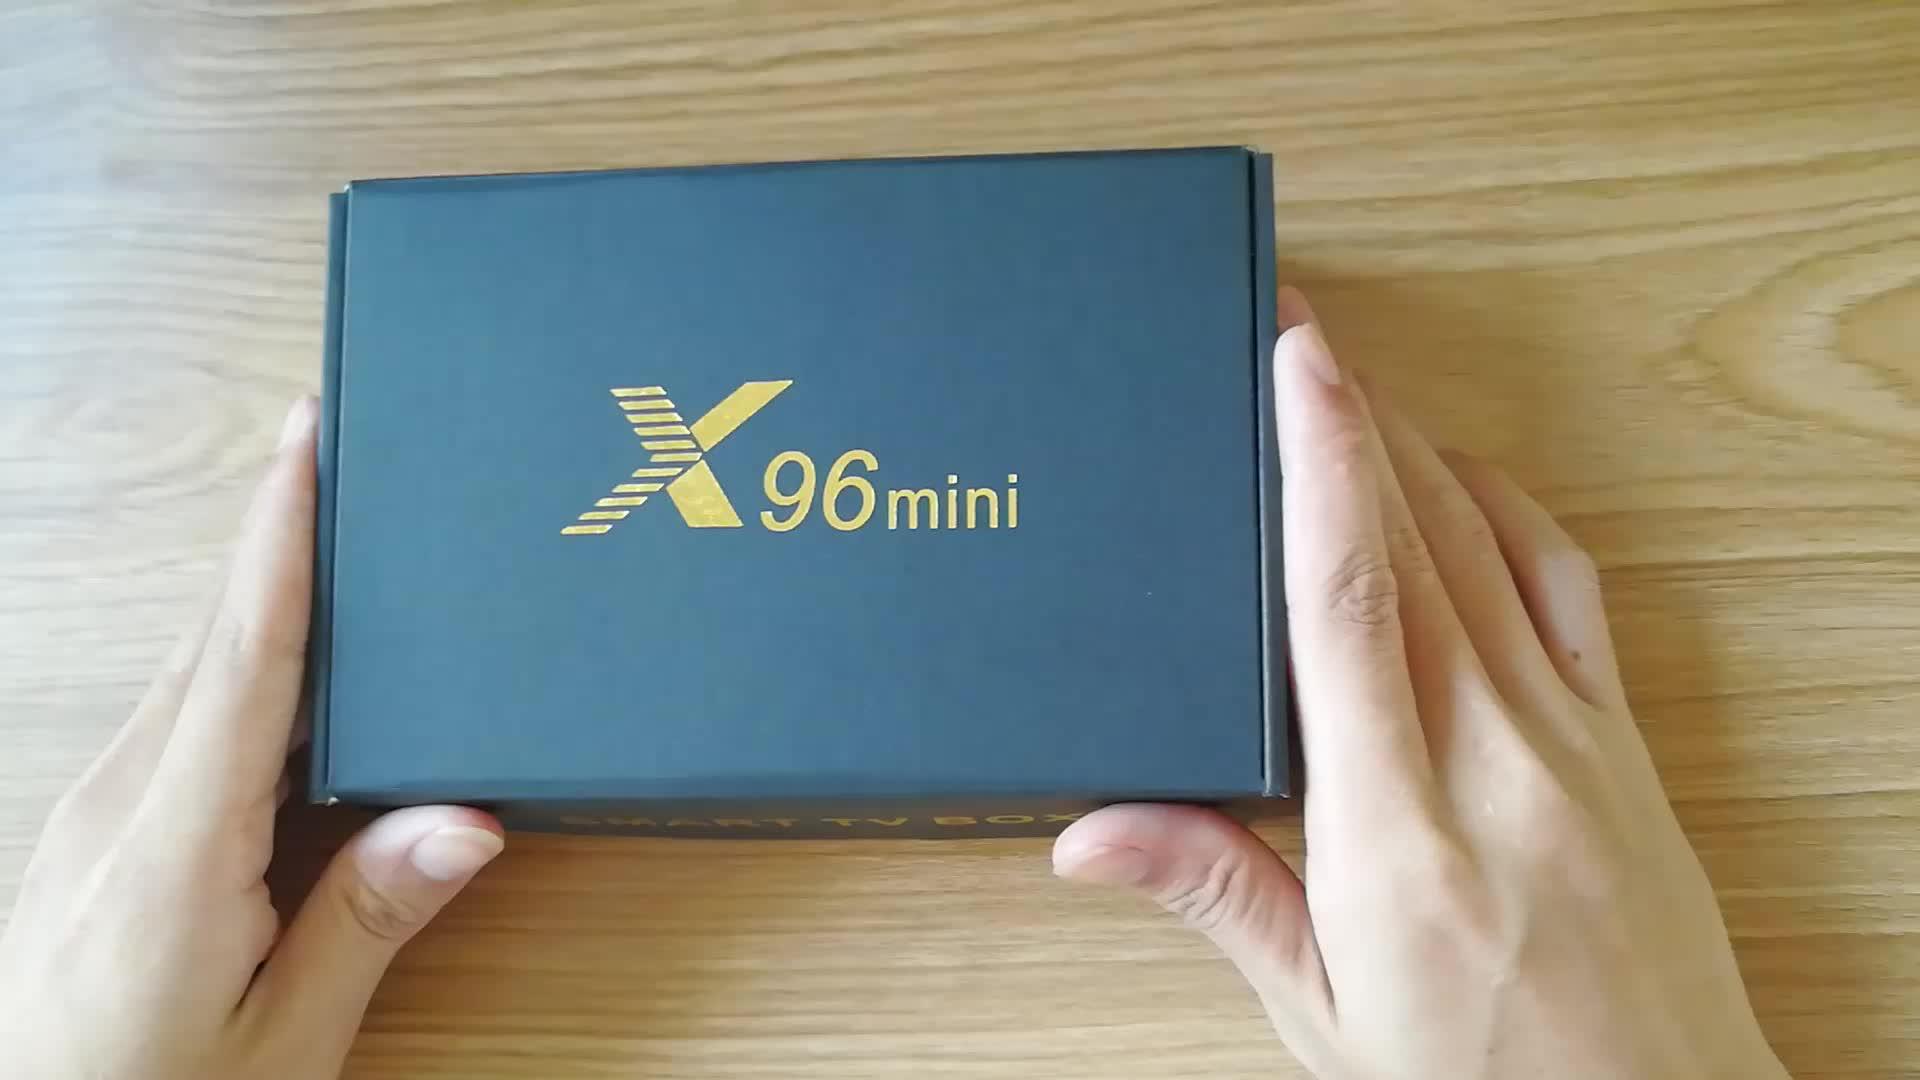 X96 мини Amlogic S905W ГБ 8 ГБ android ТВ коробка android 7,1x96 4 К к full hd 4 ядра умные телевизоры коробка для Интернет ТВ приставка